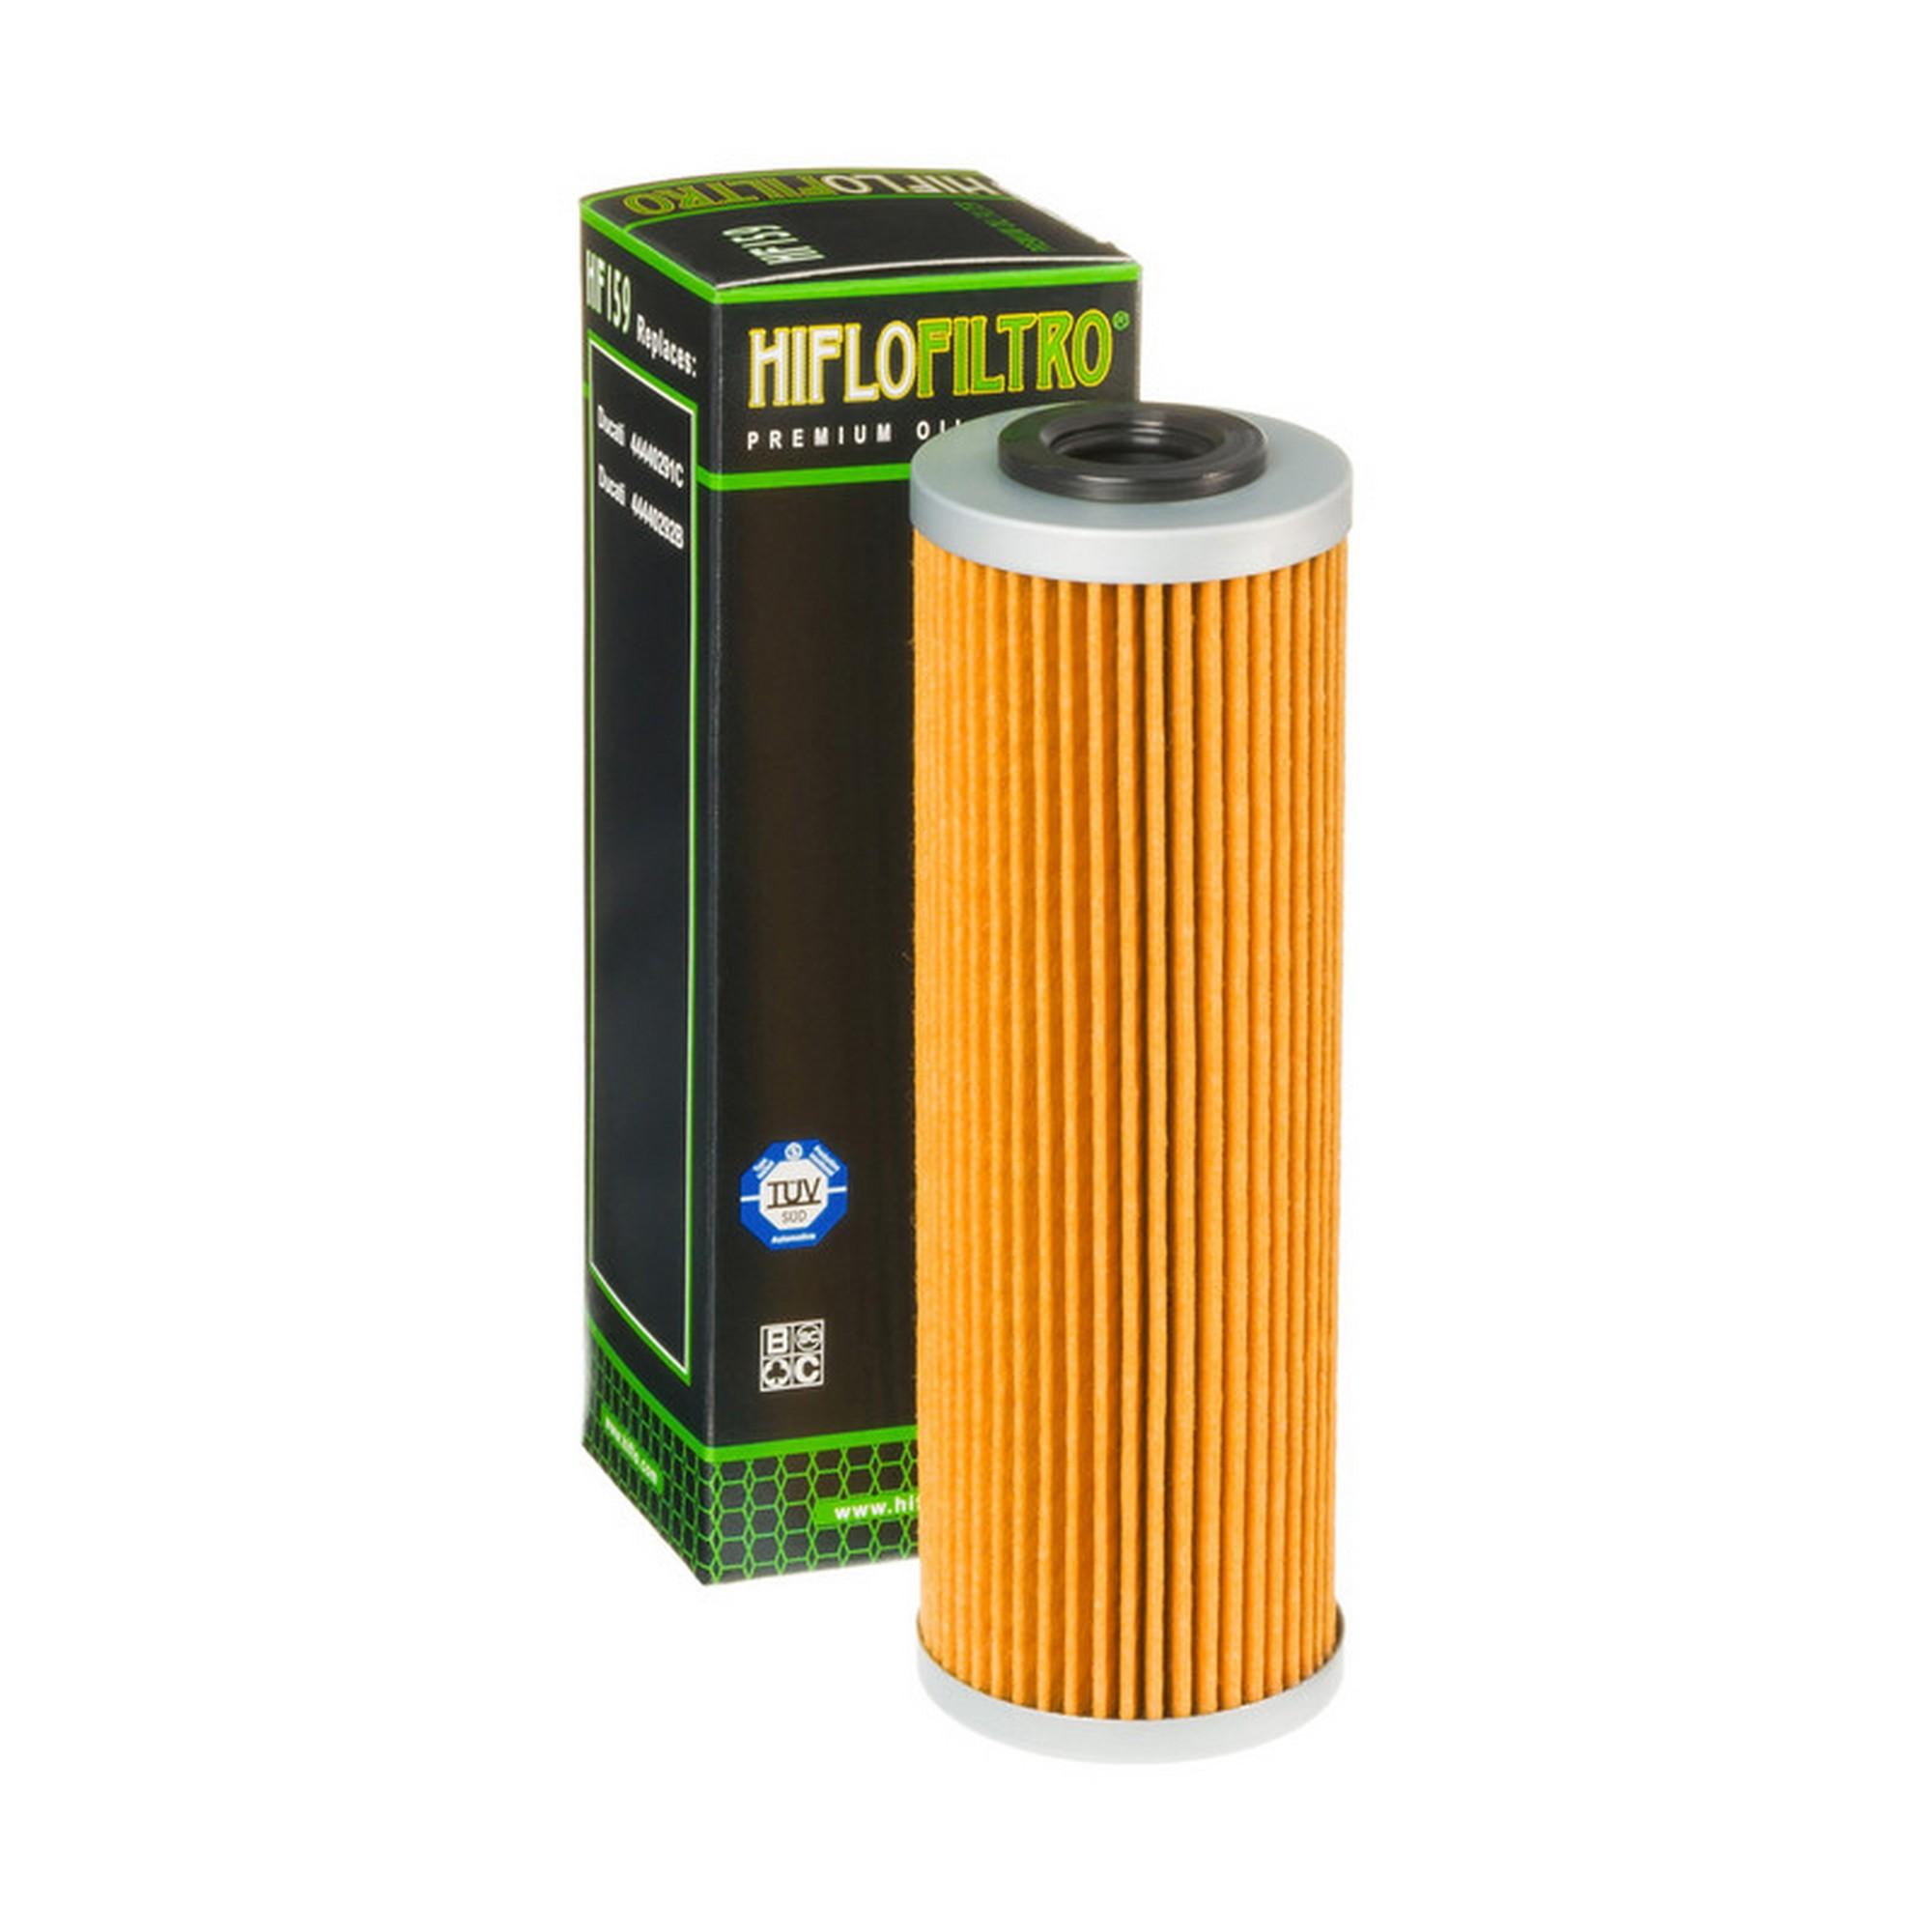 Hiflo Oil Filter HF159 Ducati 1199 Panigale R 2013-2014